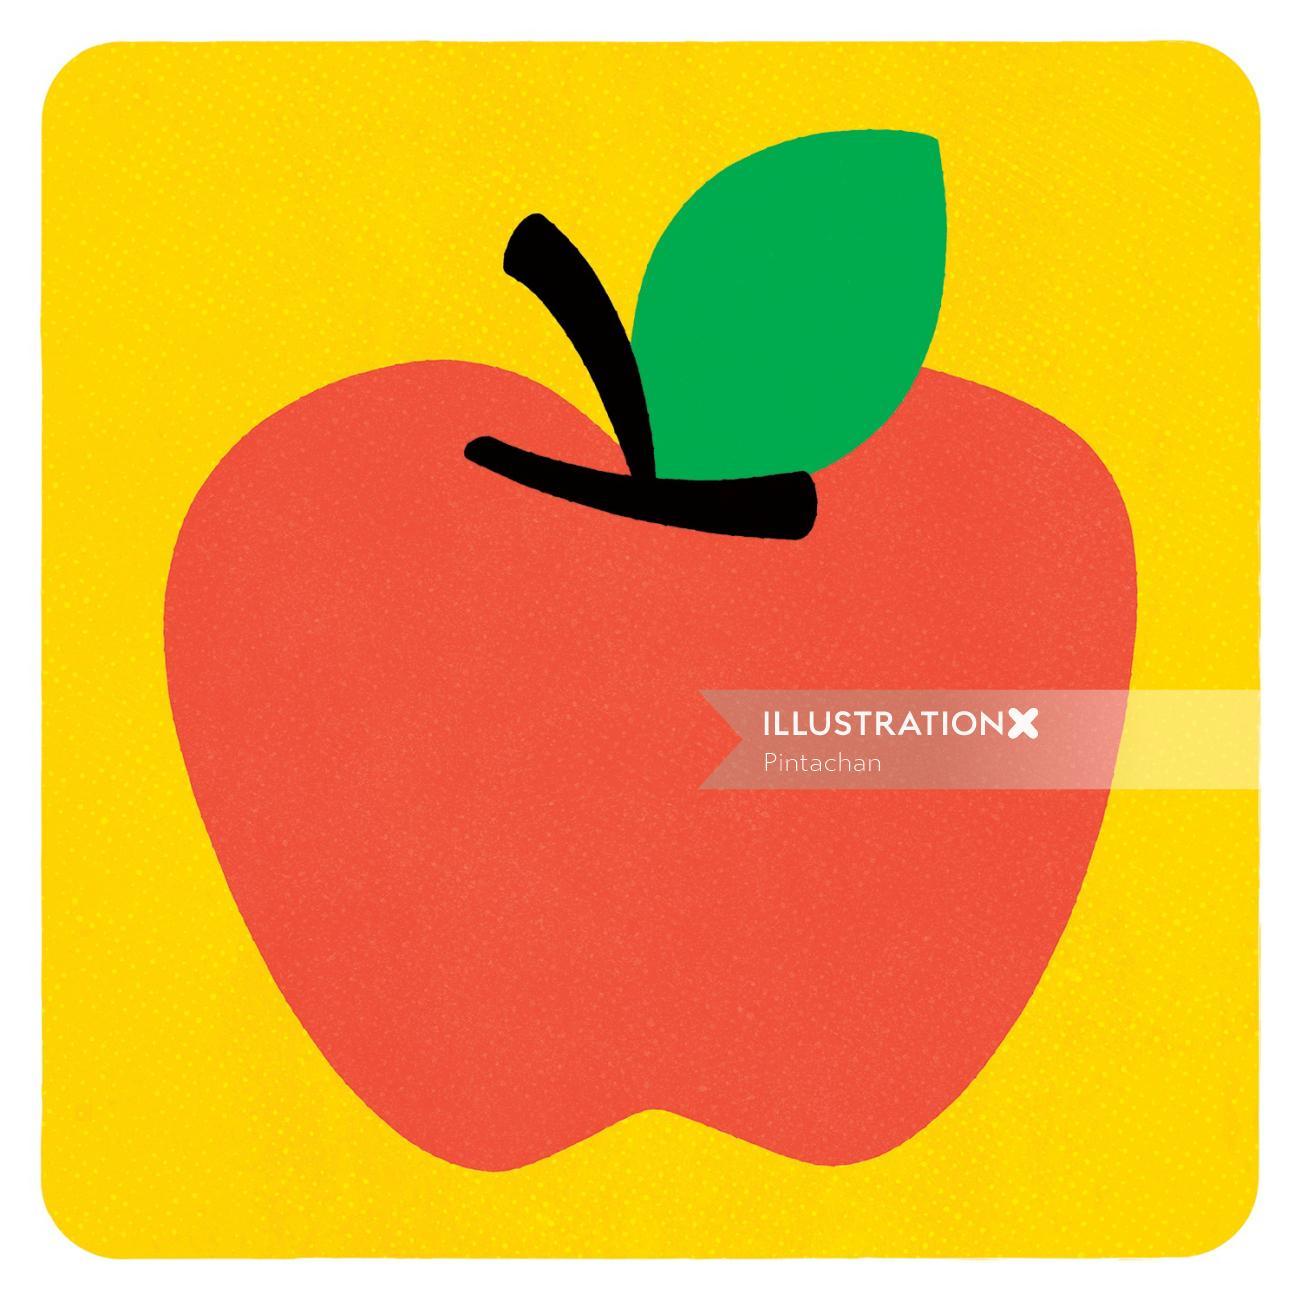 Digital apple by Pintachan